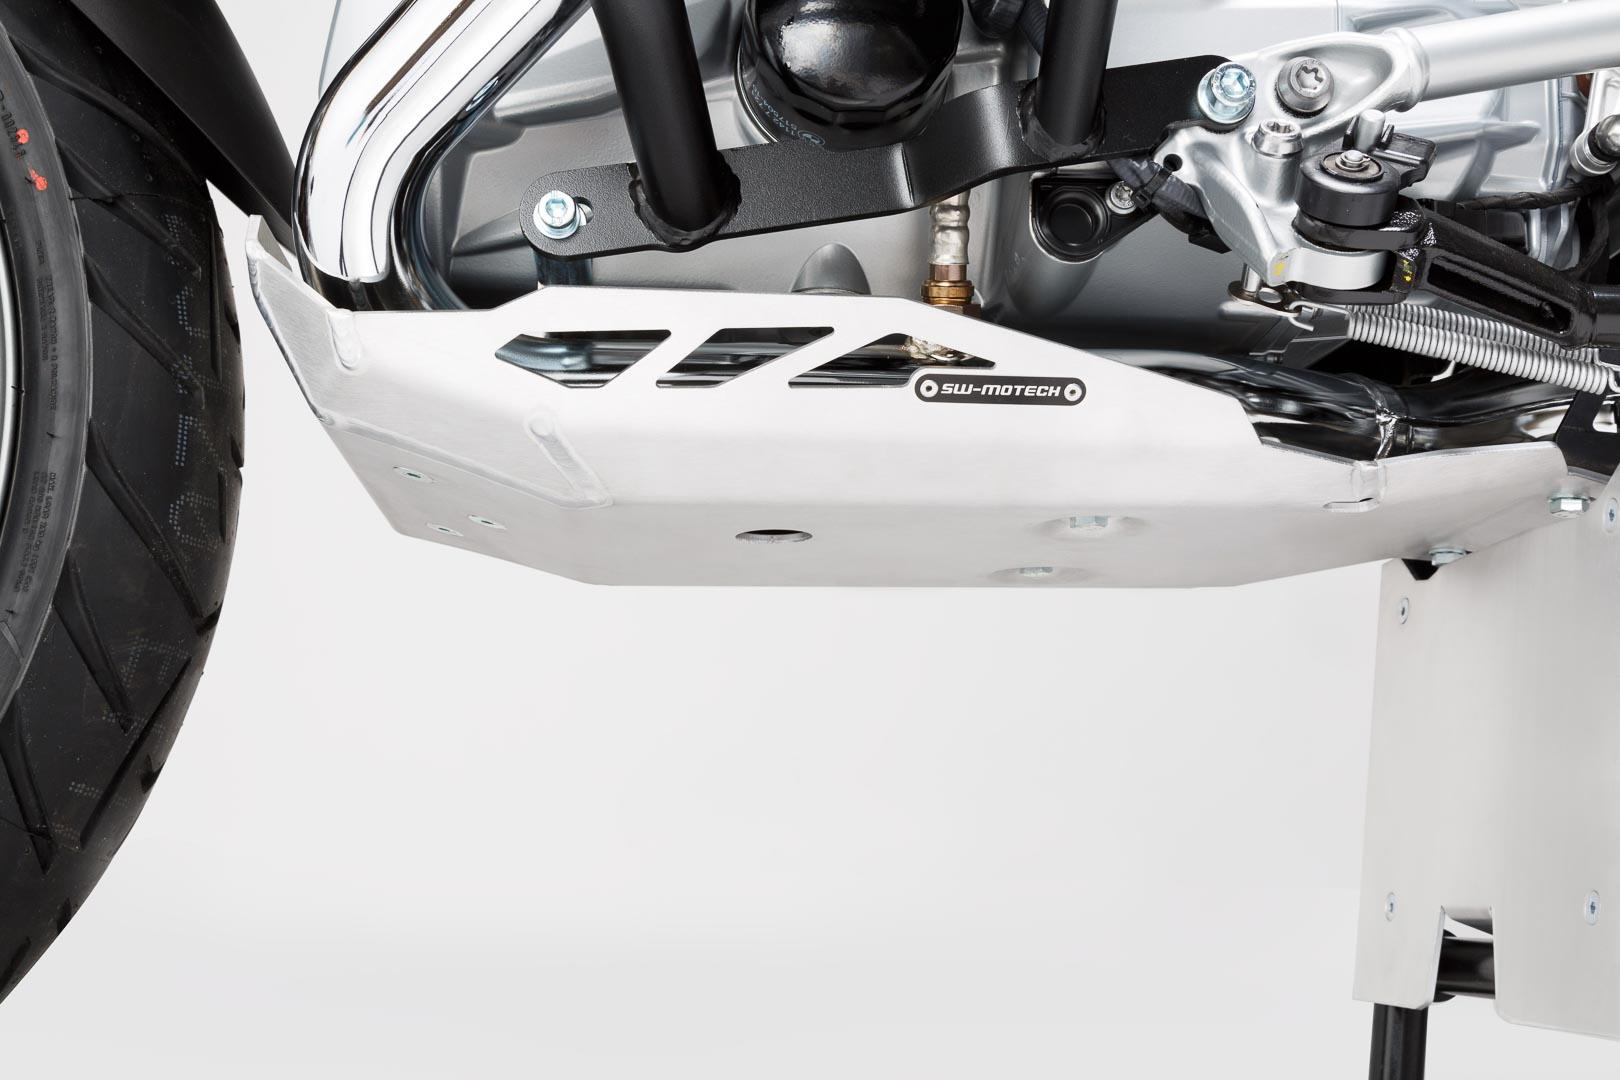 Pohjapanssari, hopea, BMW R1200 GSLC / Adventure (12-), Rallye